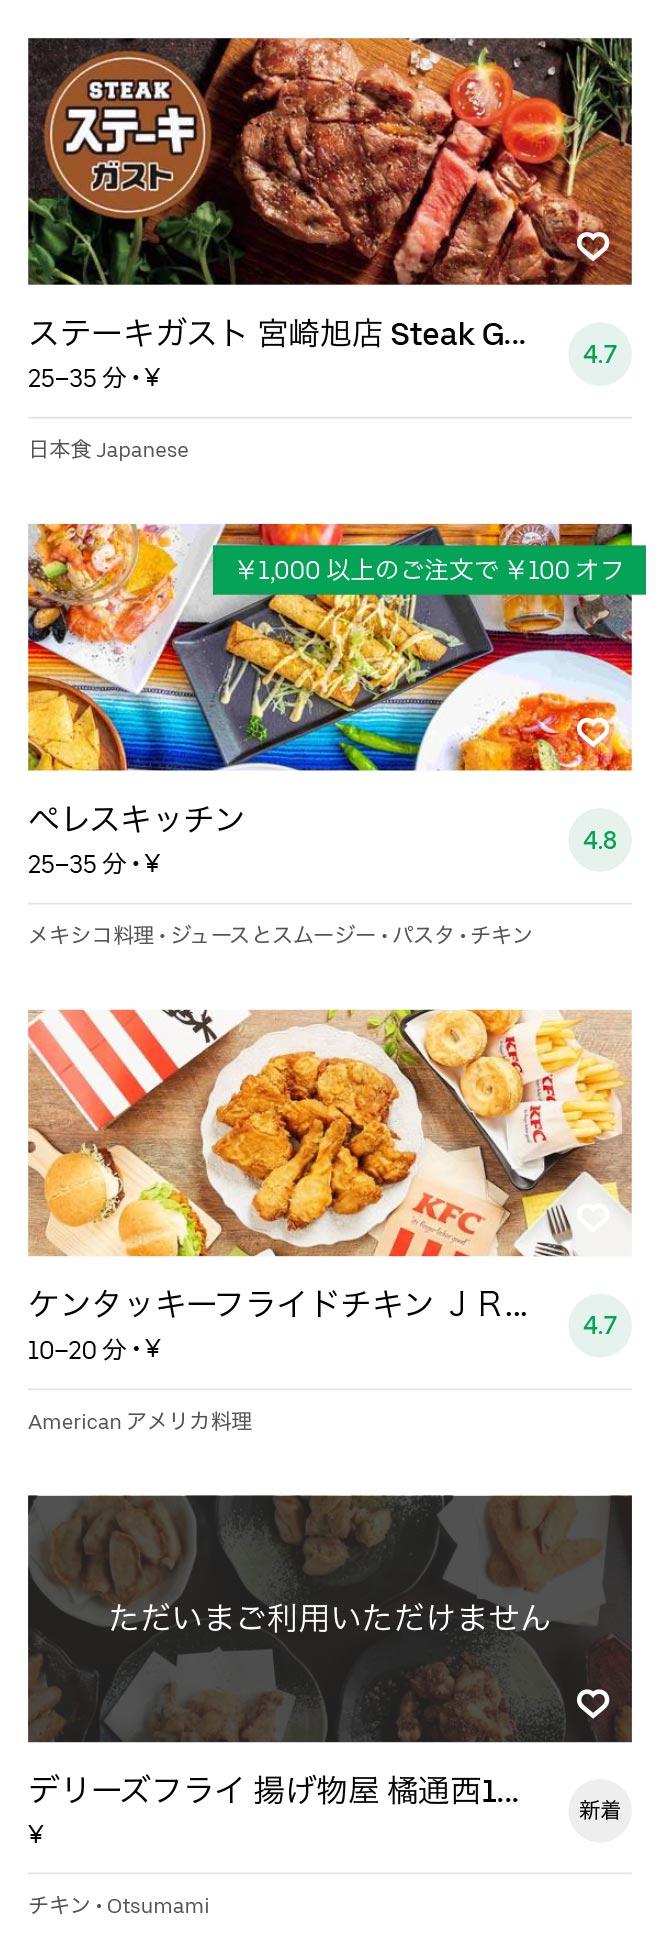 Miyazaki menu 2009 6